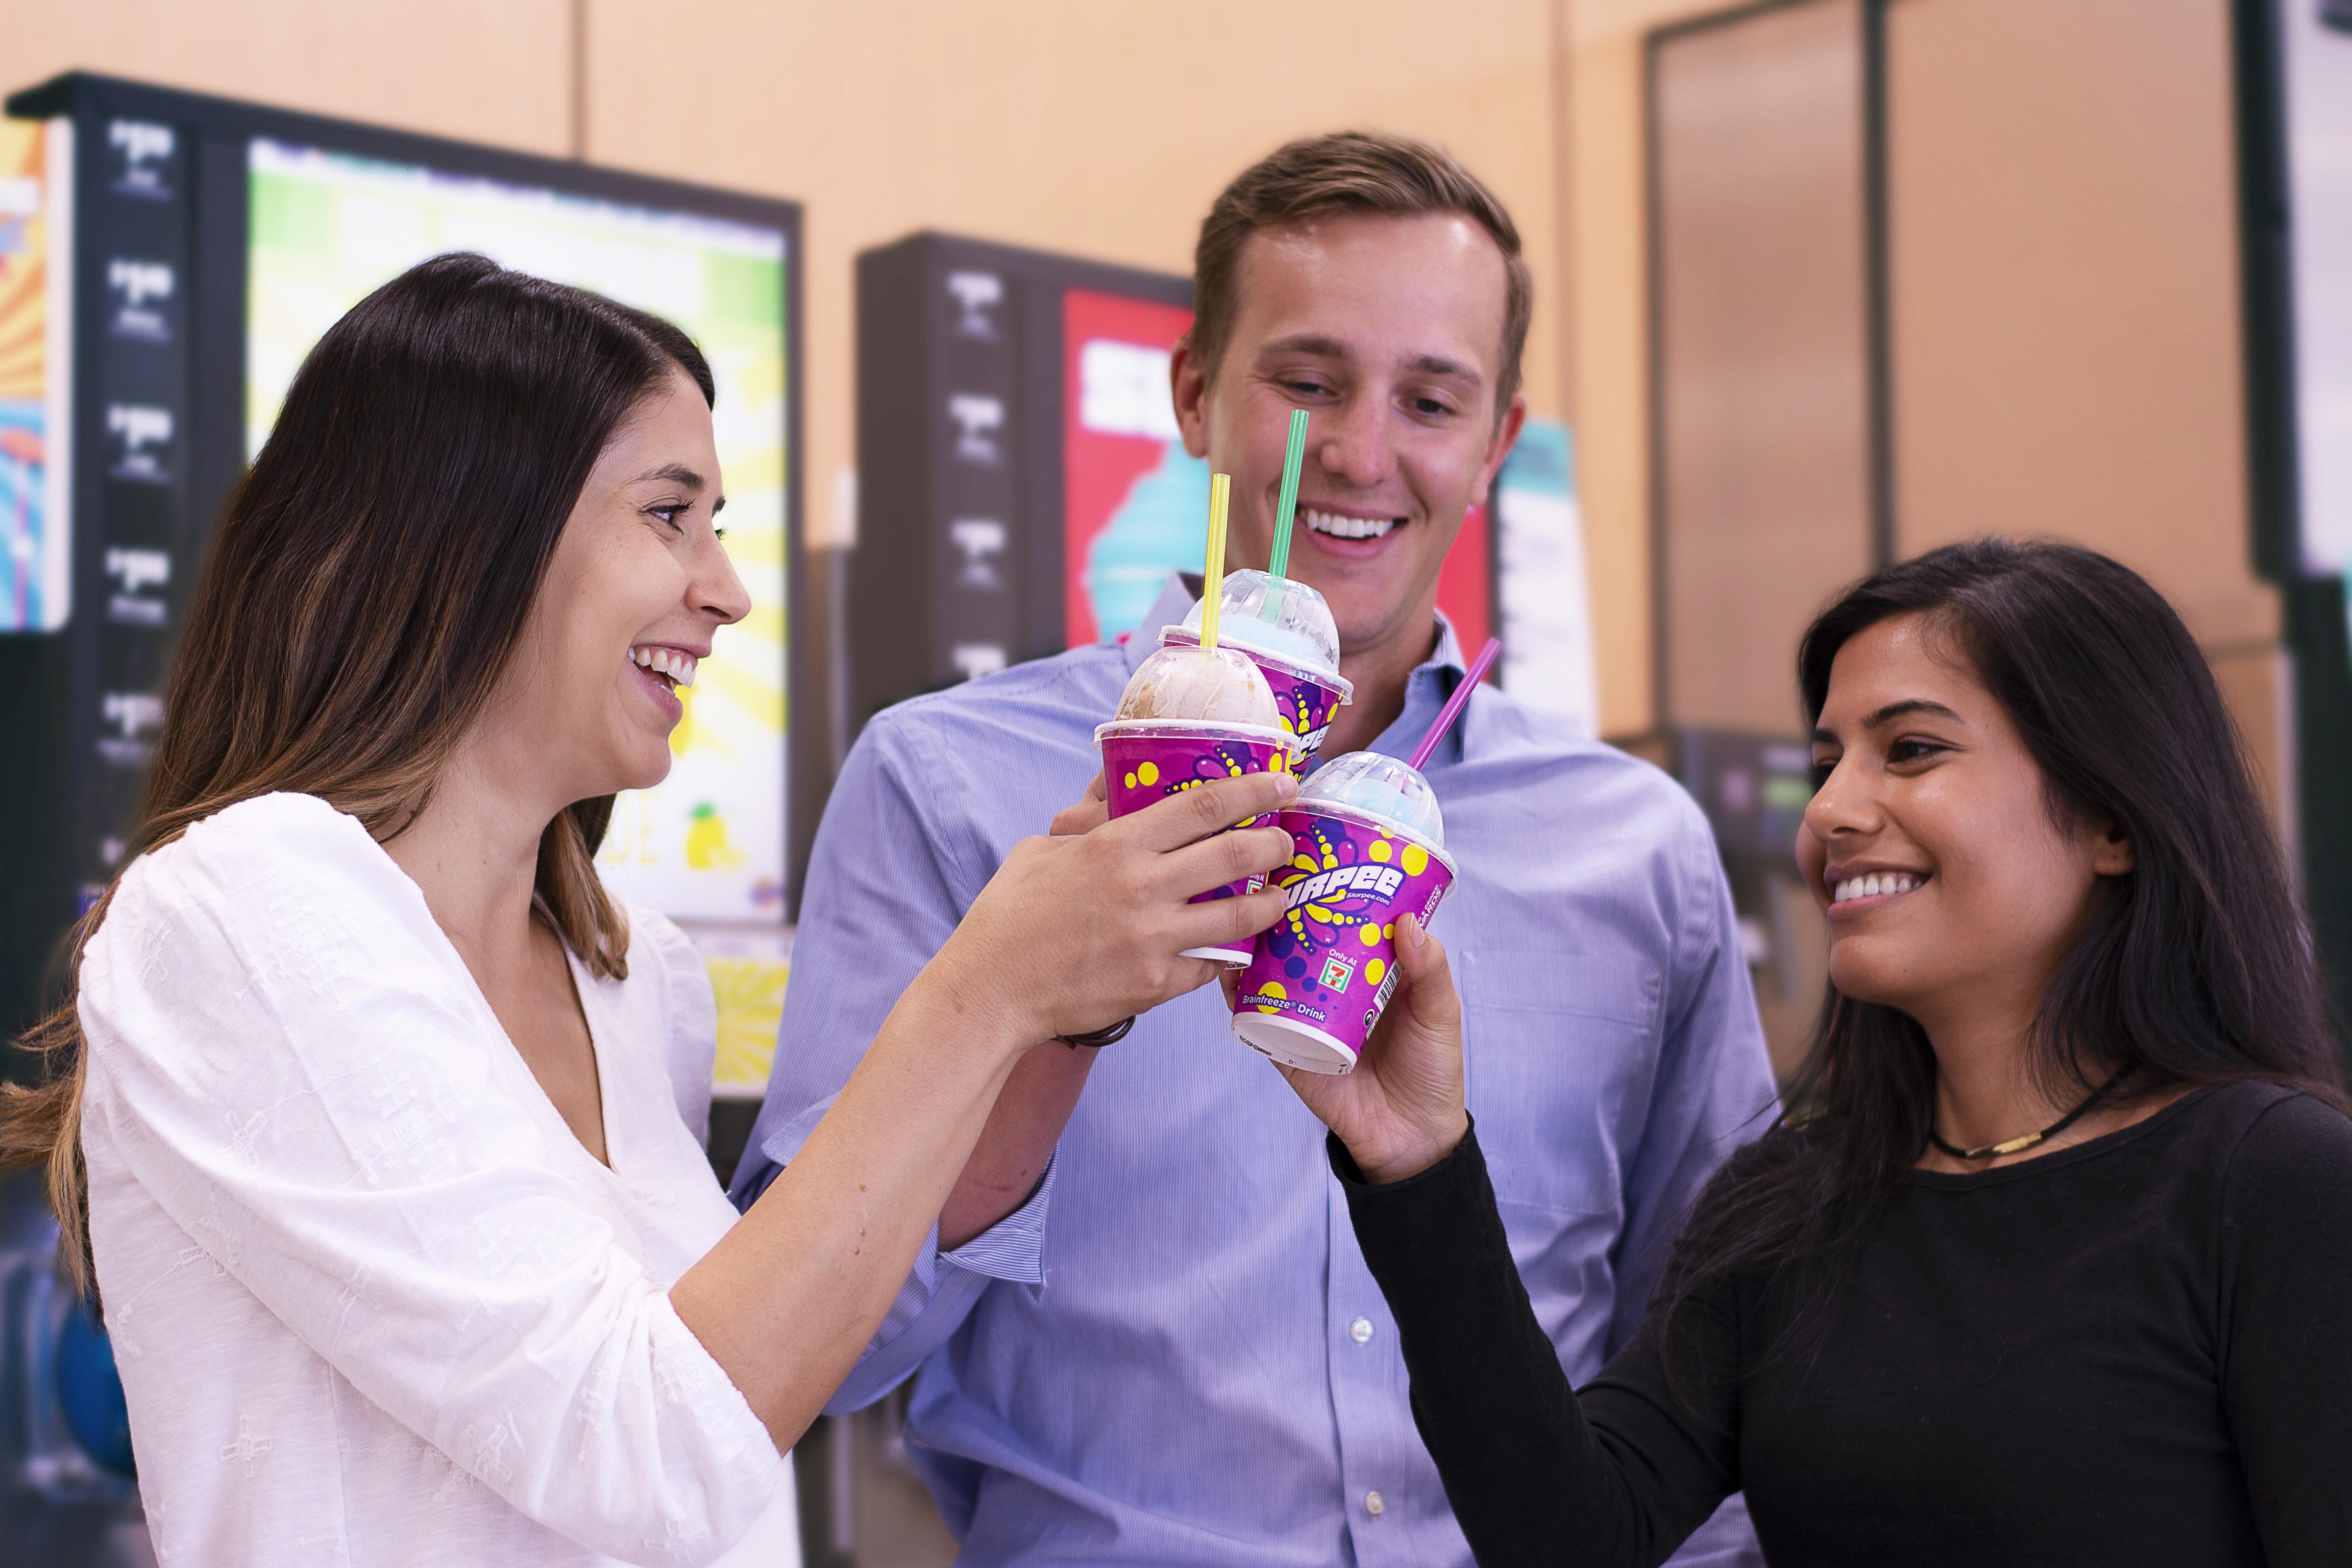 FREE Slurpee Day at 7-Eleven – July 11, 2018